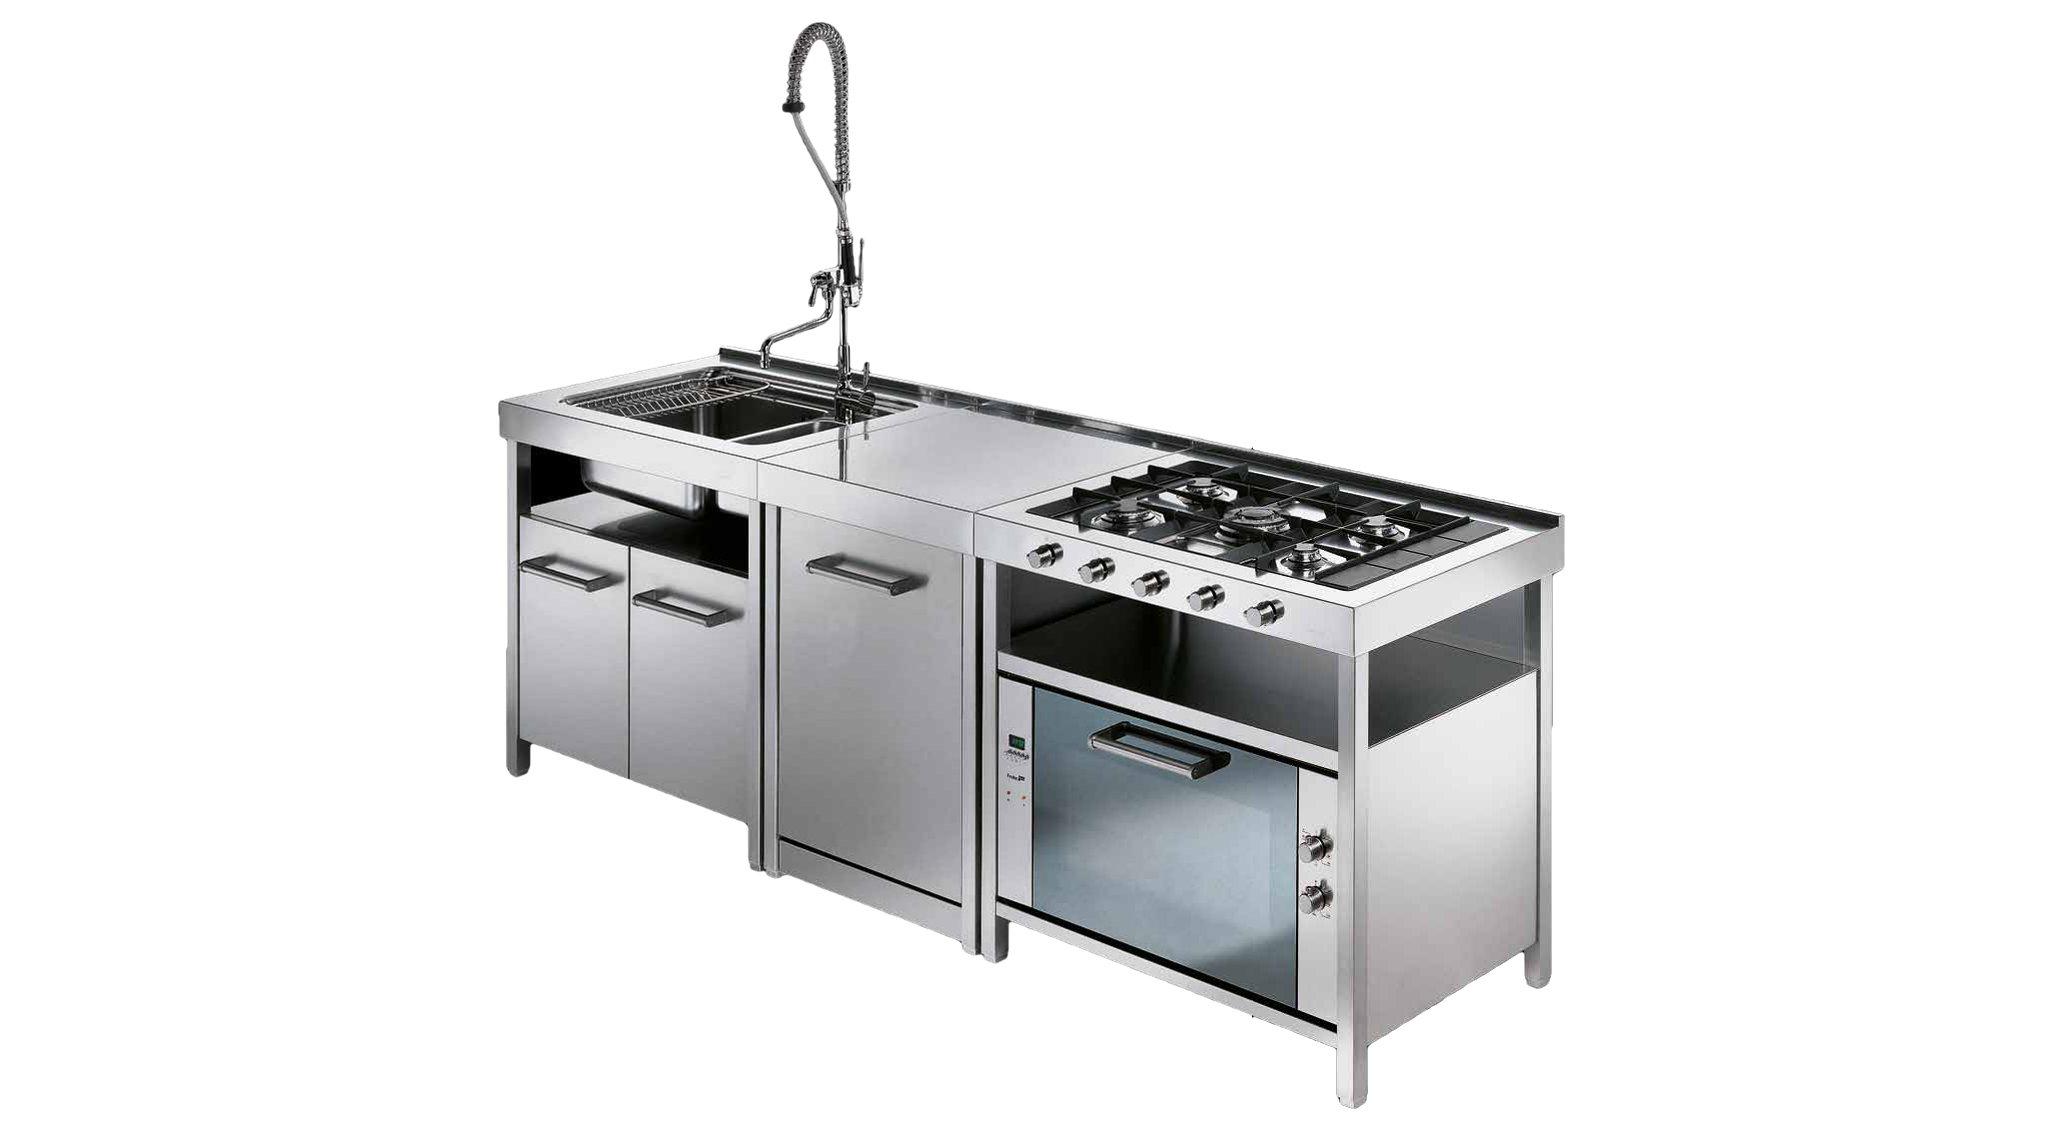 Cucina Freestanding Ikea  28 images  17 best images